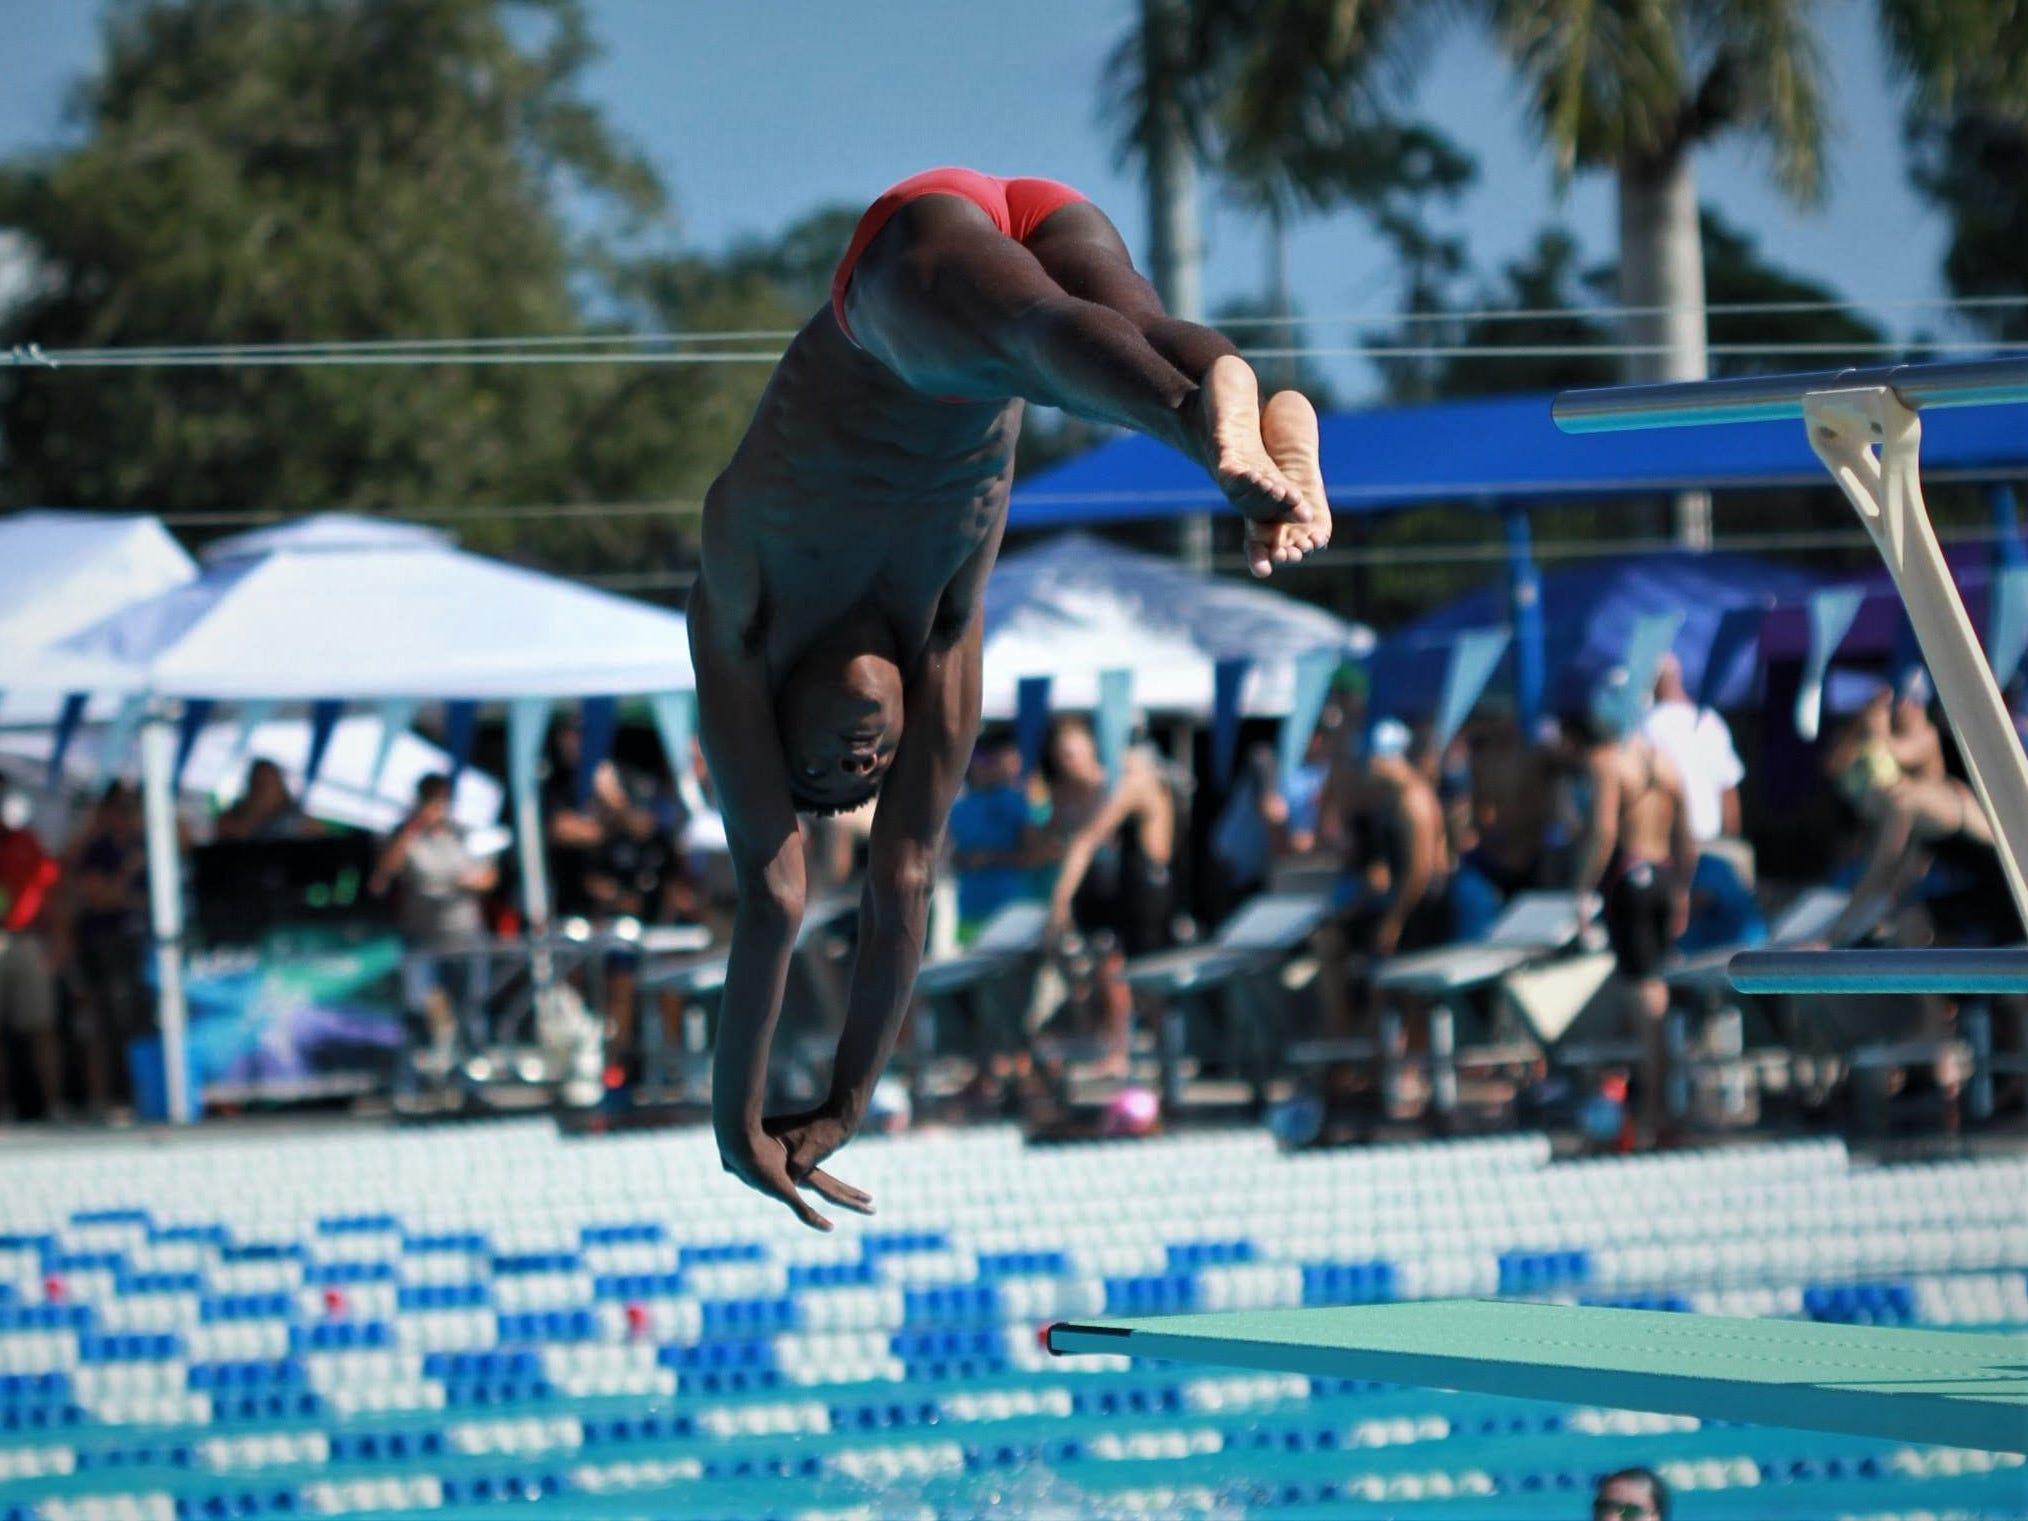 Leon diver Cole, Chiles swimmers Kwan, Hanlon win state titles